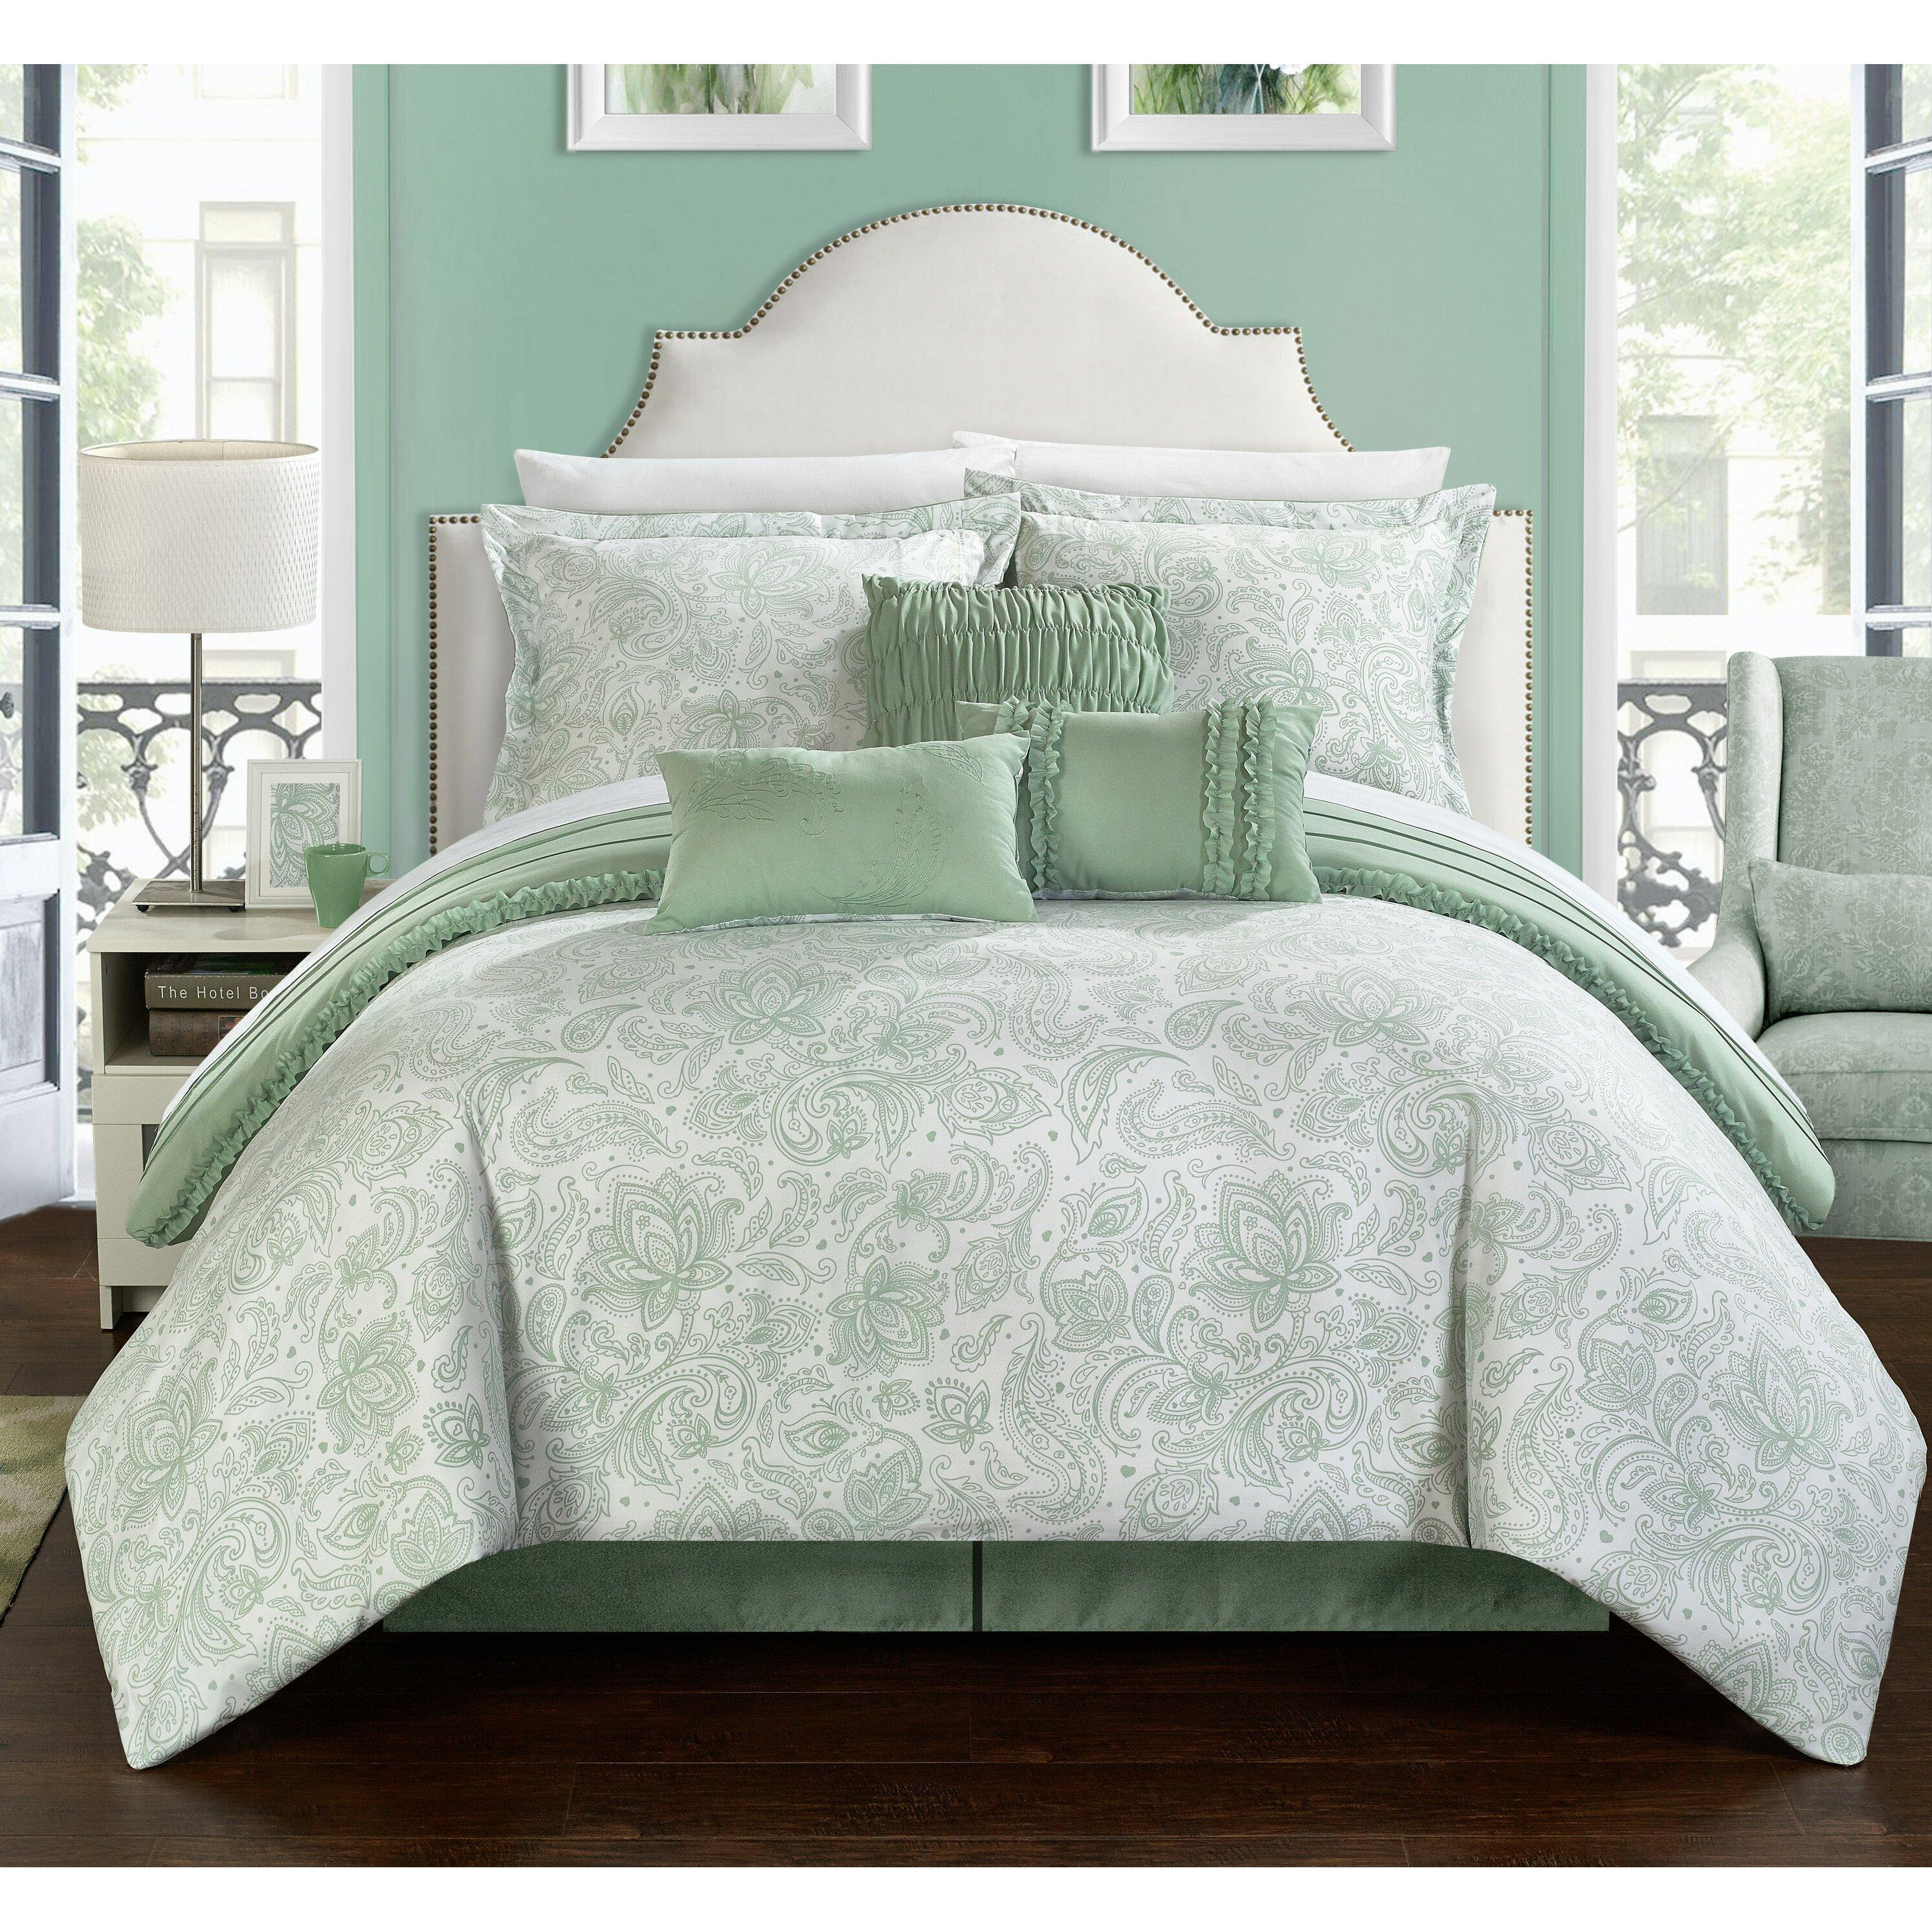 Chic home elle reversible comforter set reviews wayfair for Elle decoration bed linen